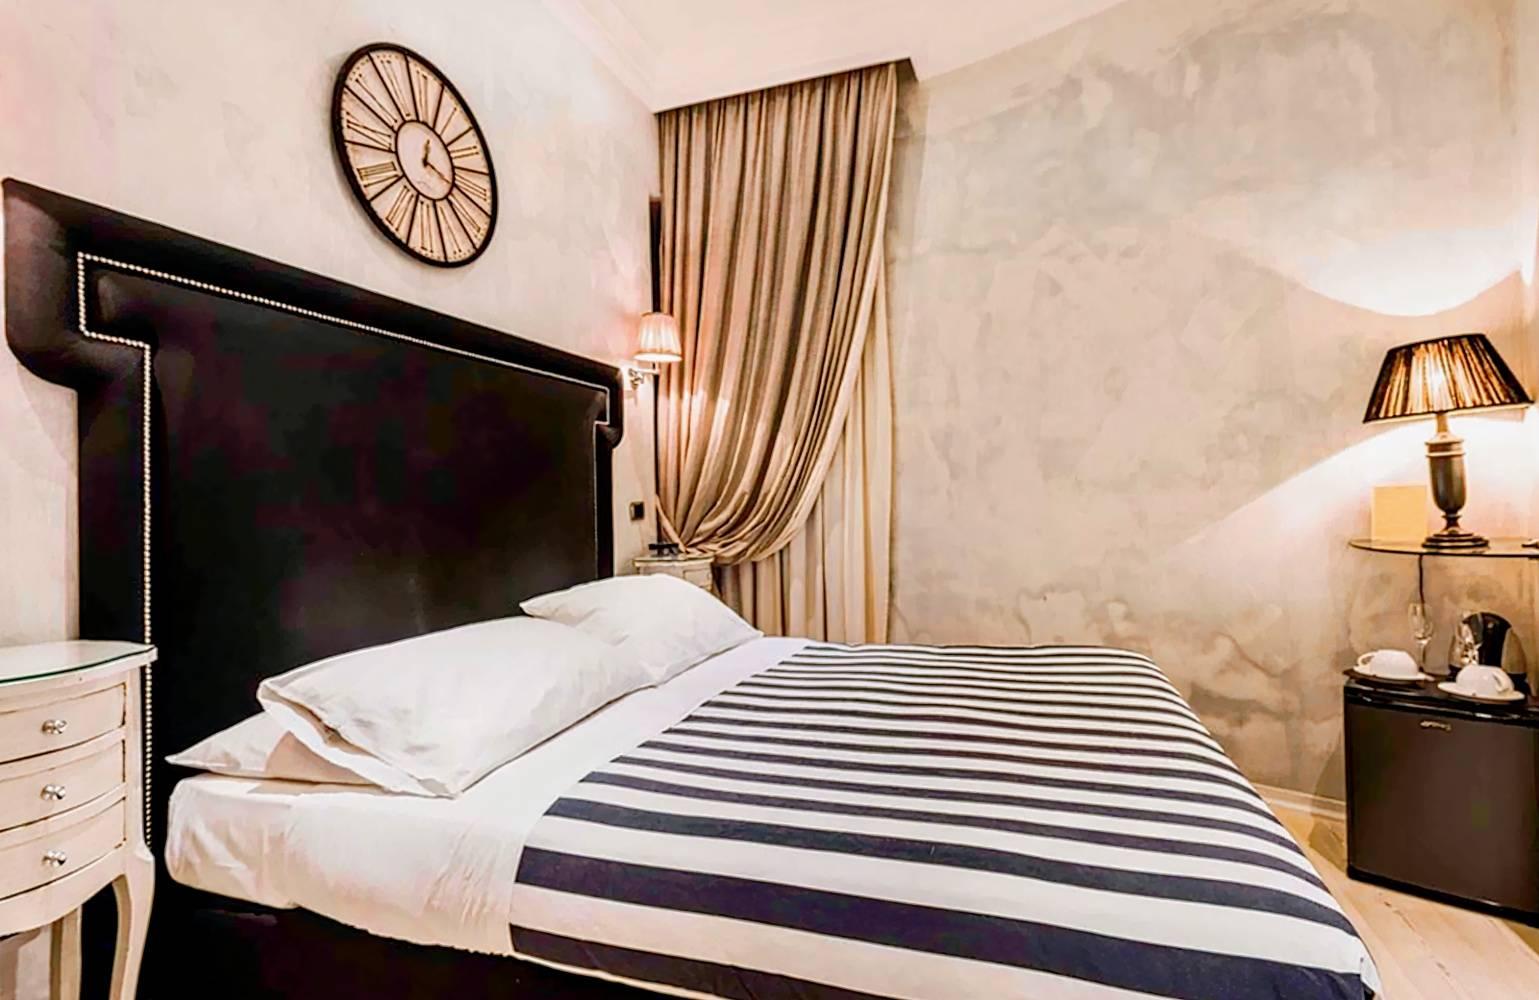 Mdm Luxury Rooms